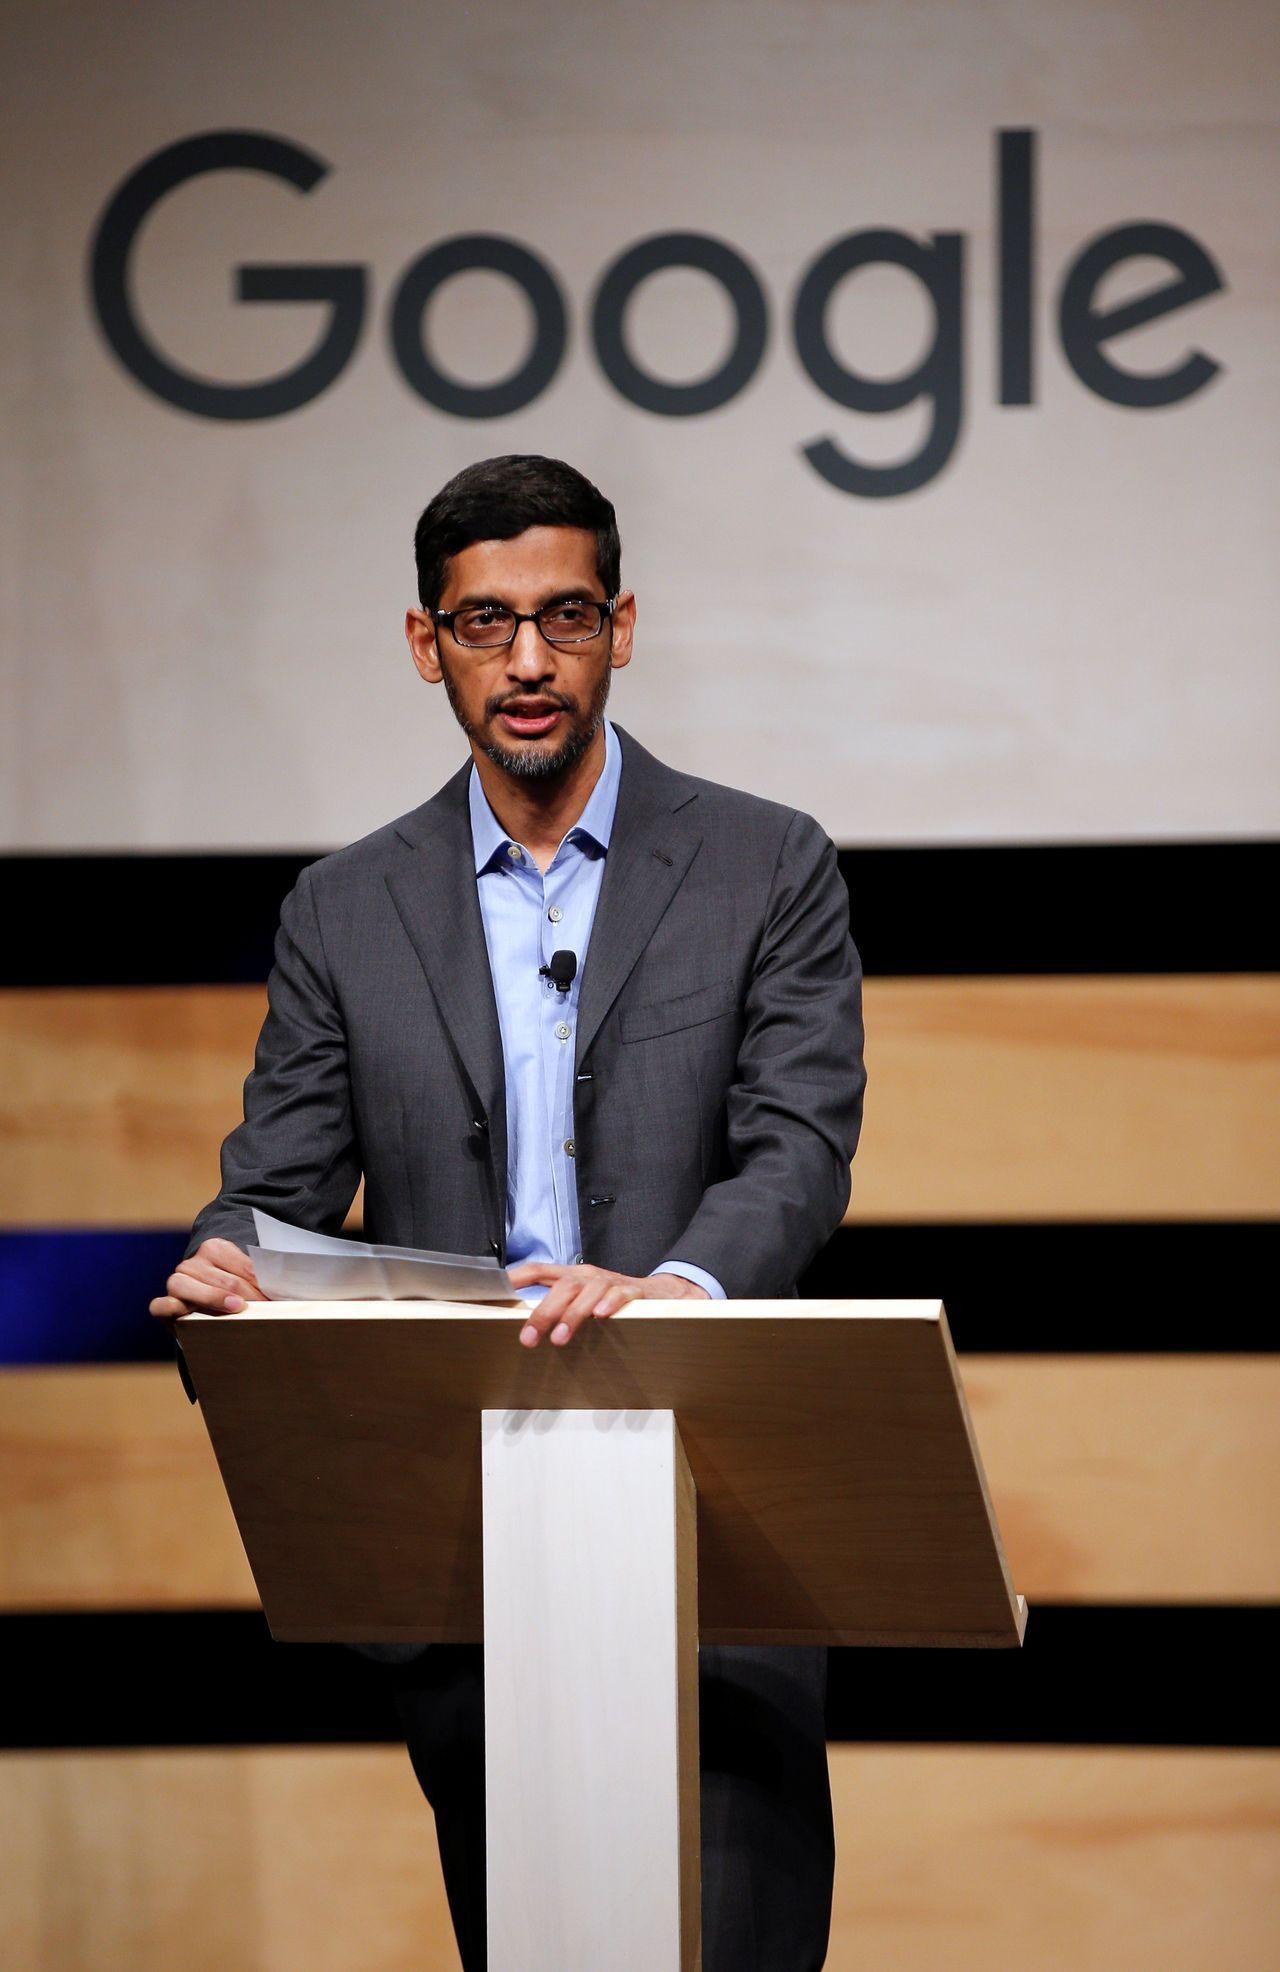 Google執行長皮伽(Sundar Pichai)。路透